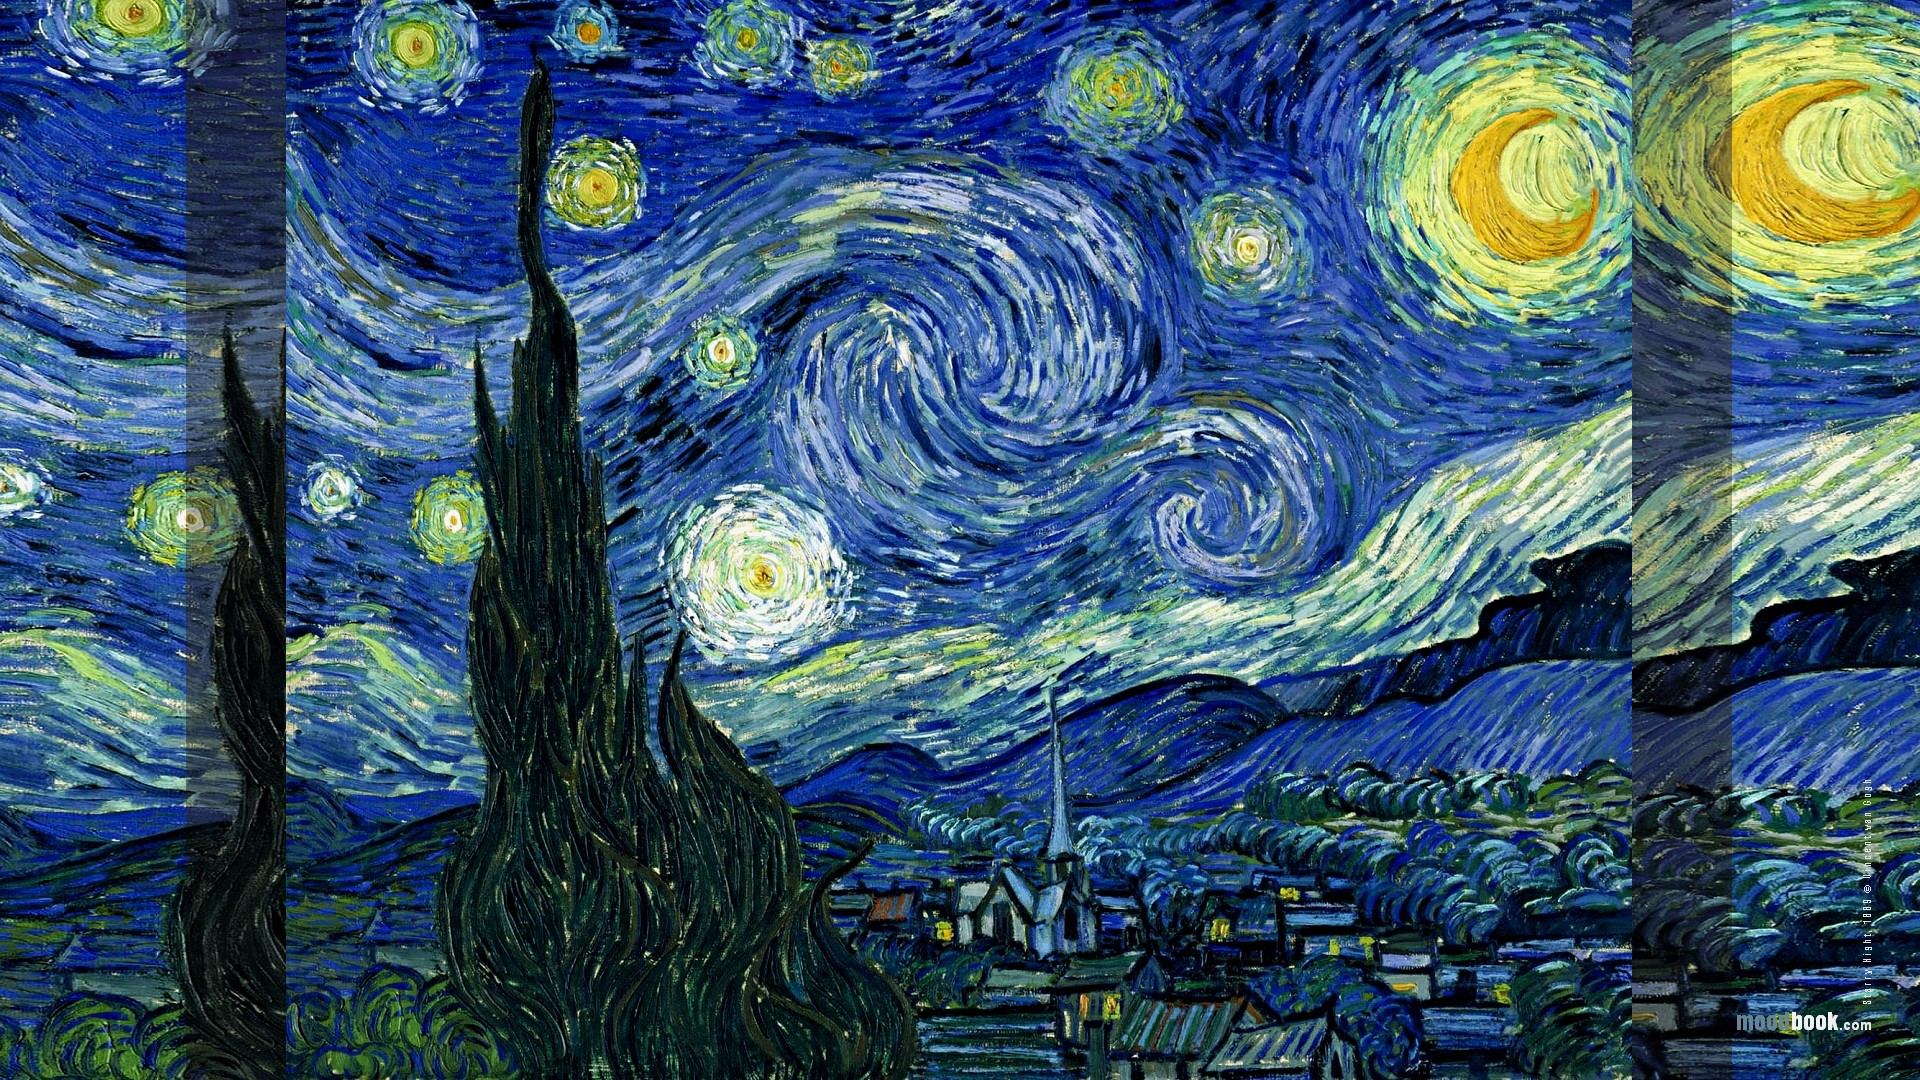 Starry Night Van Gogh Wallpaper Release date Specs Review 1920x1080